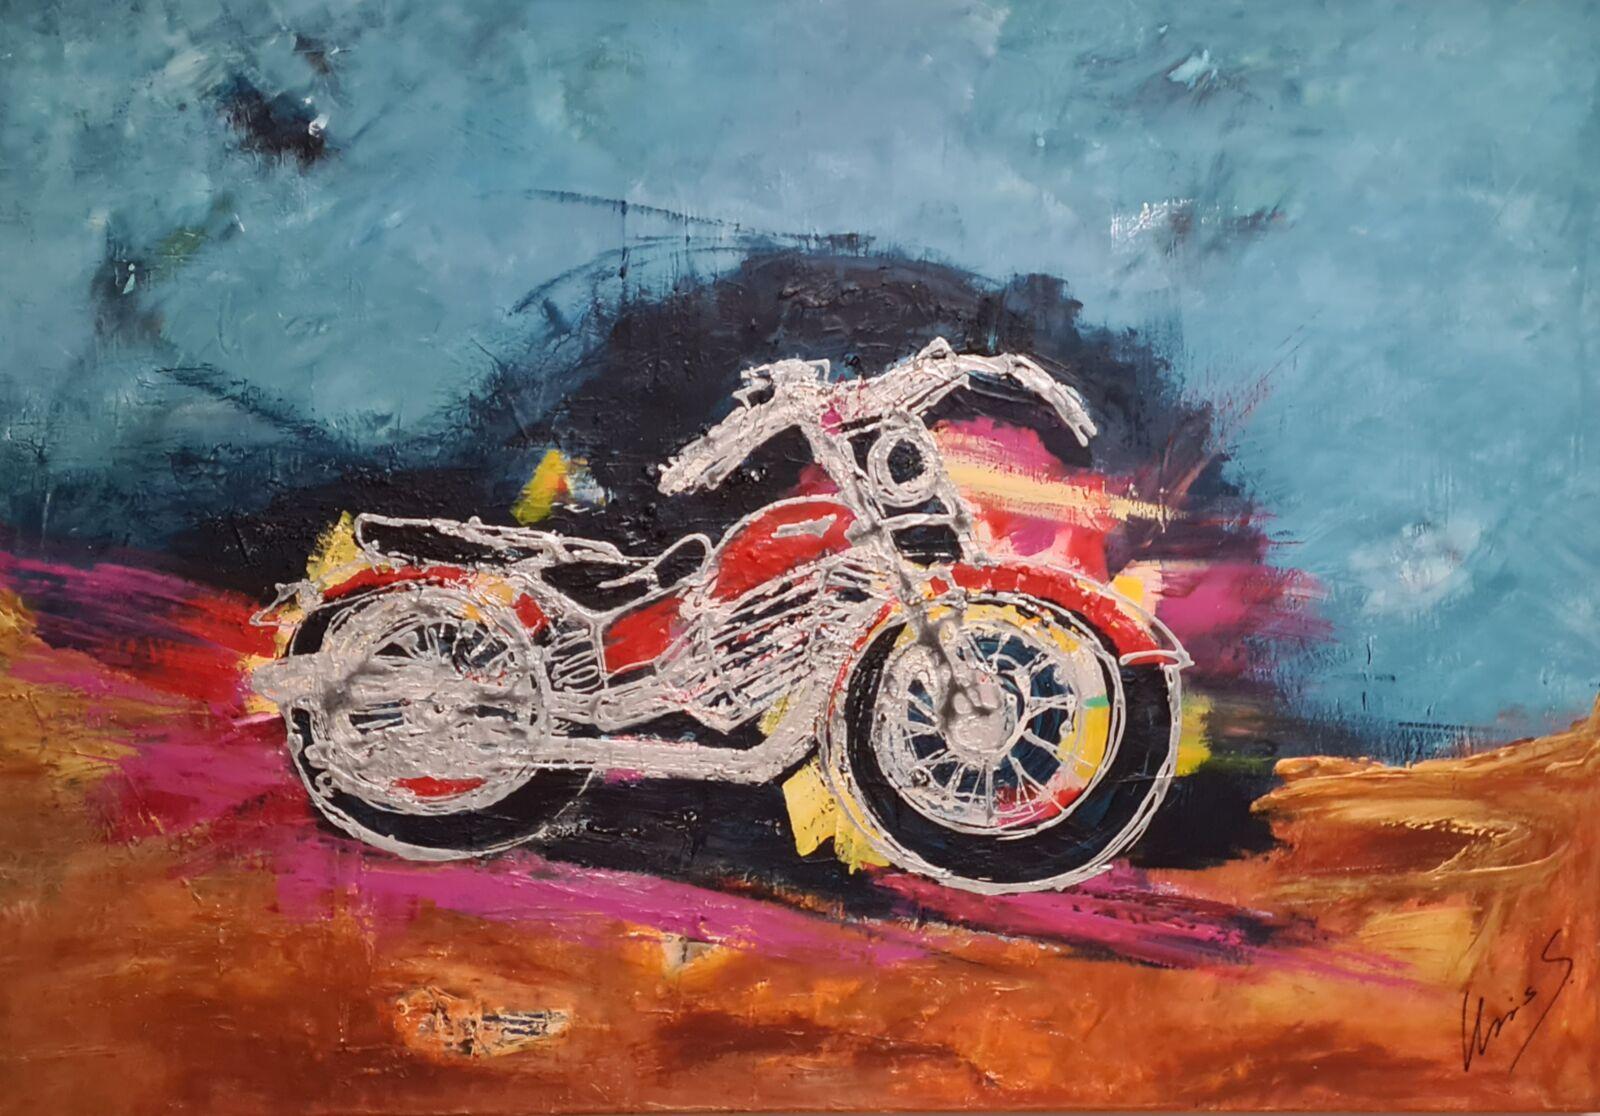 Ghost rider 100 x 70 cm